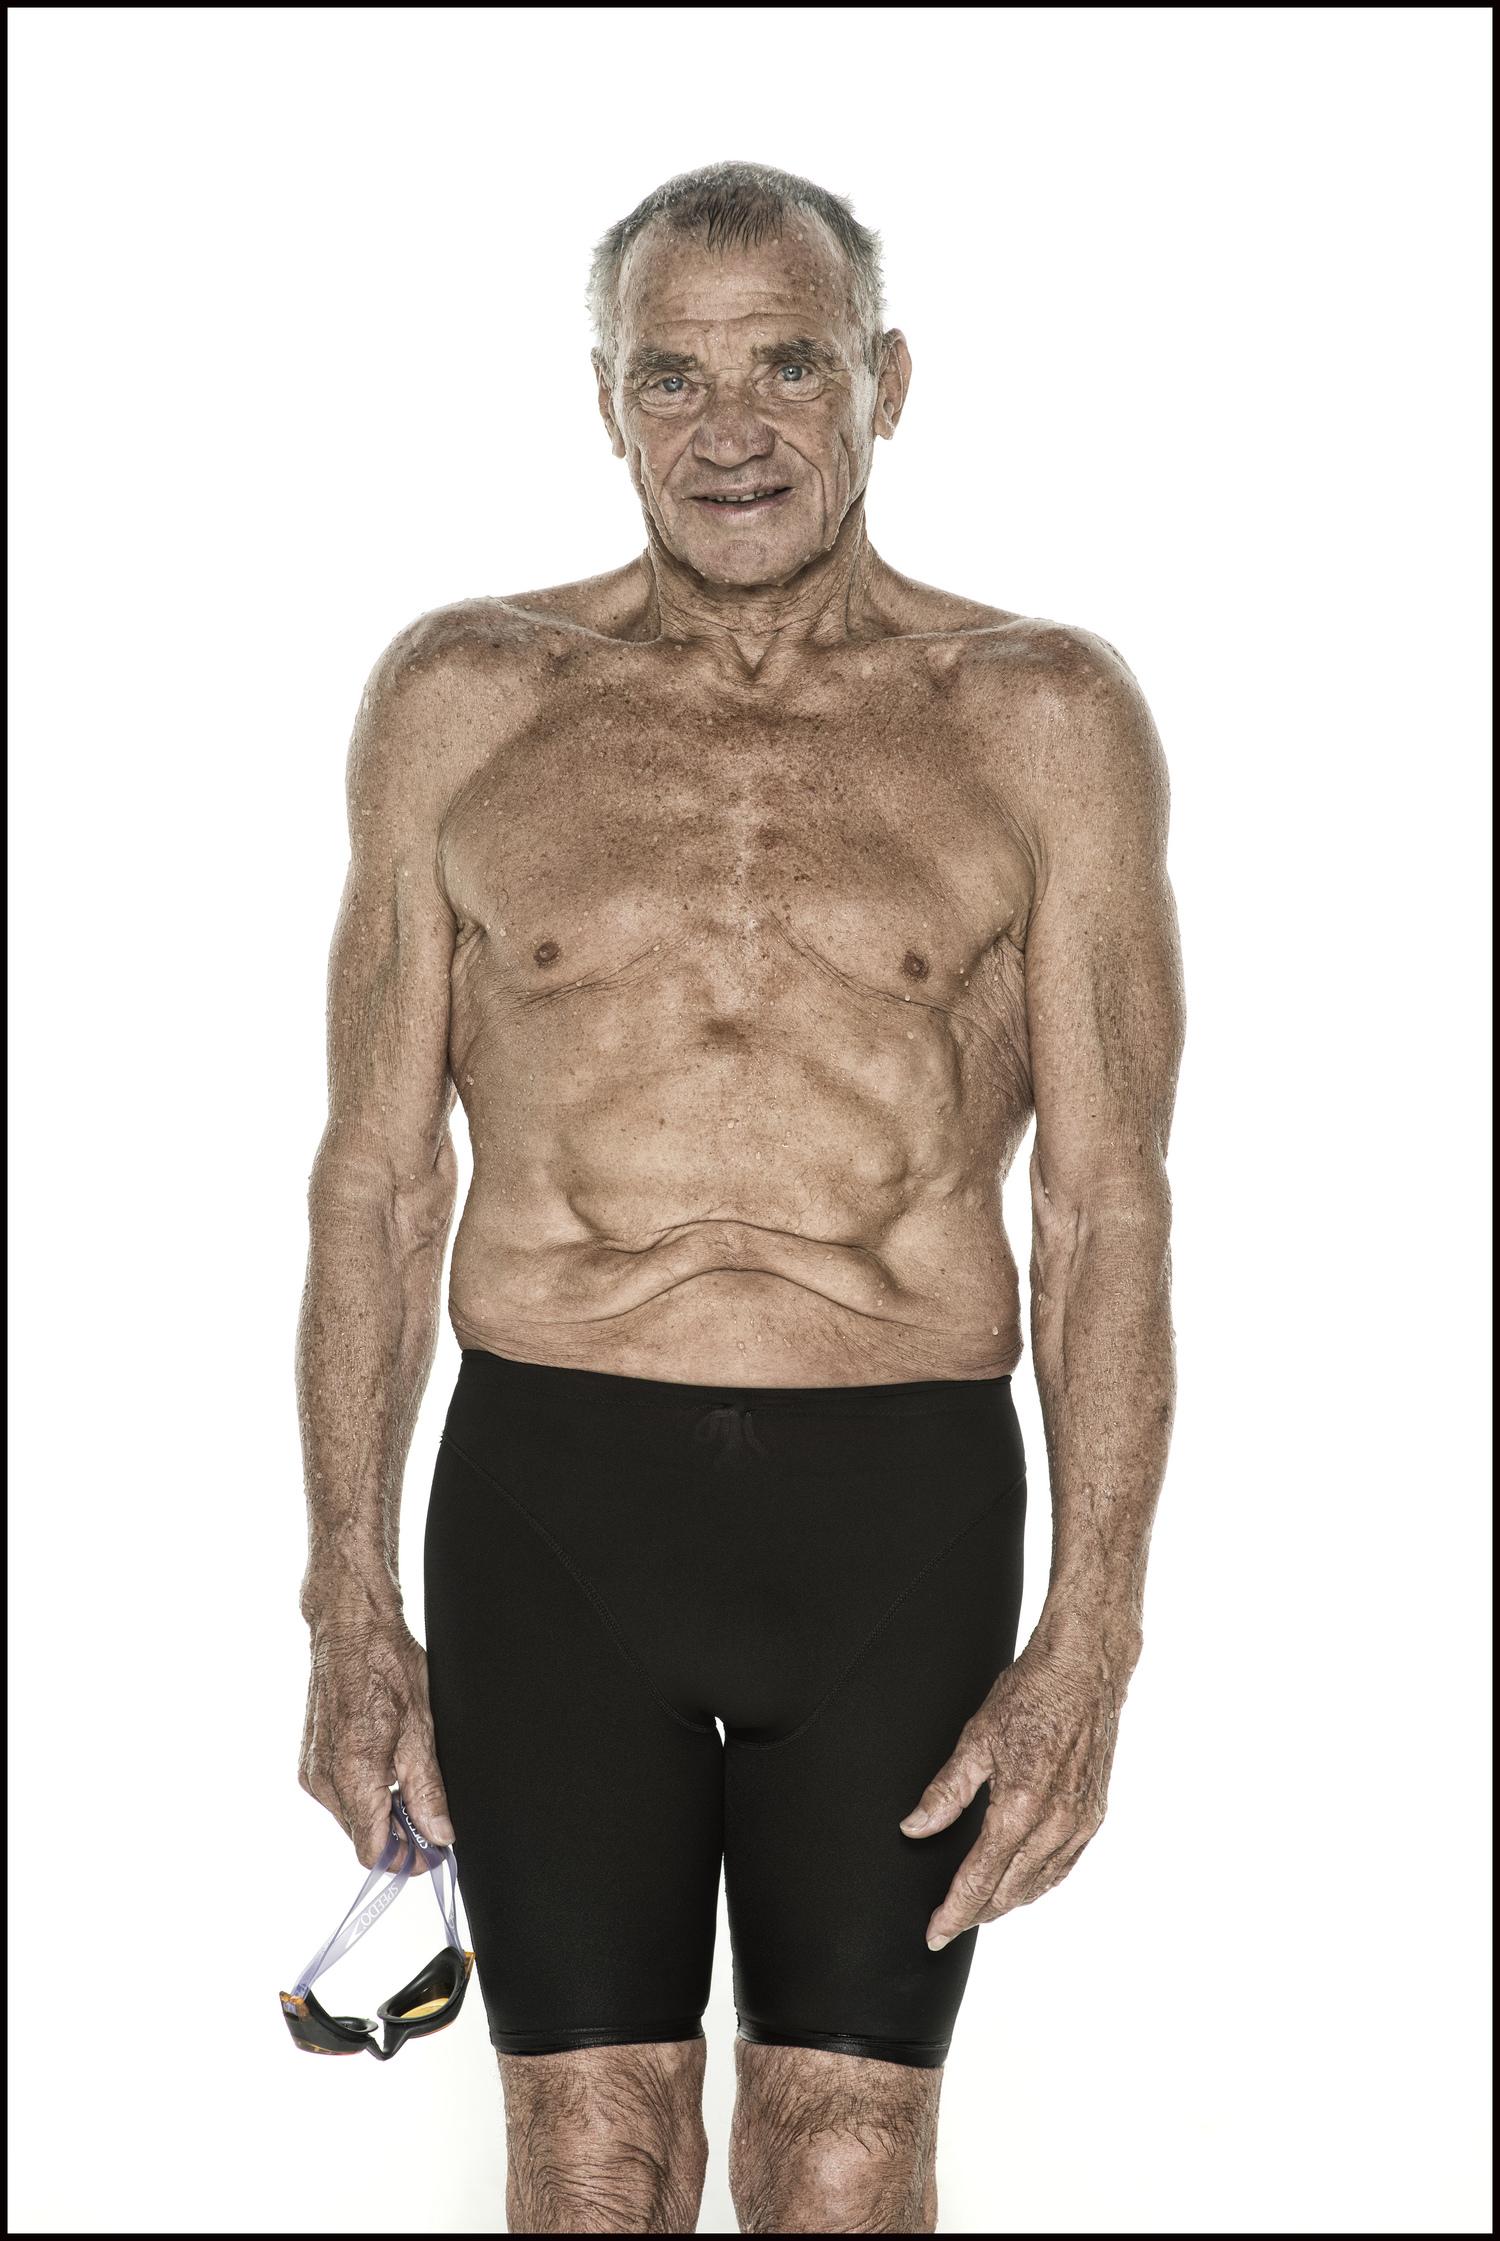 Josef+Krejci,+Zwitserland,+80+jaar.jpg